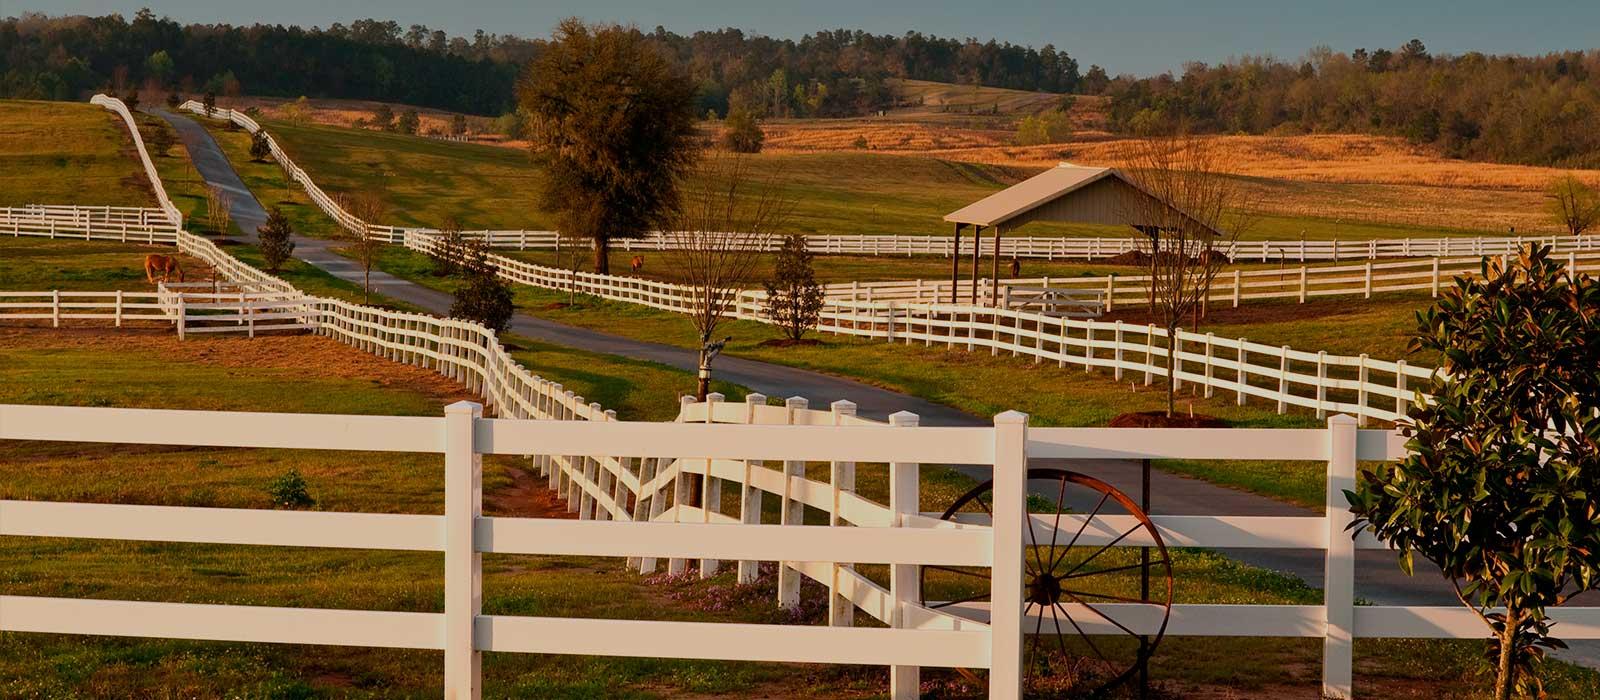 Professional Farm And Ranch Fence Service San Antonio Tx